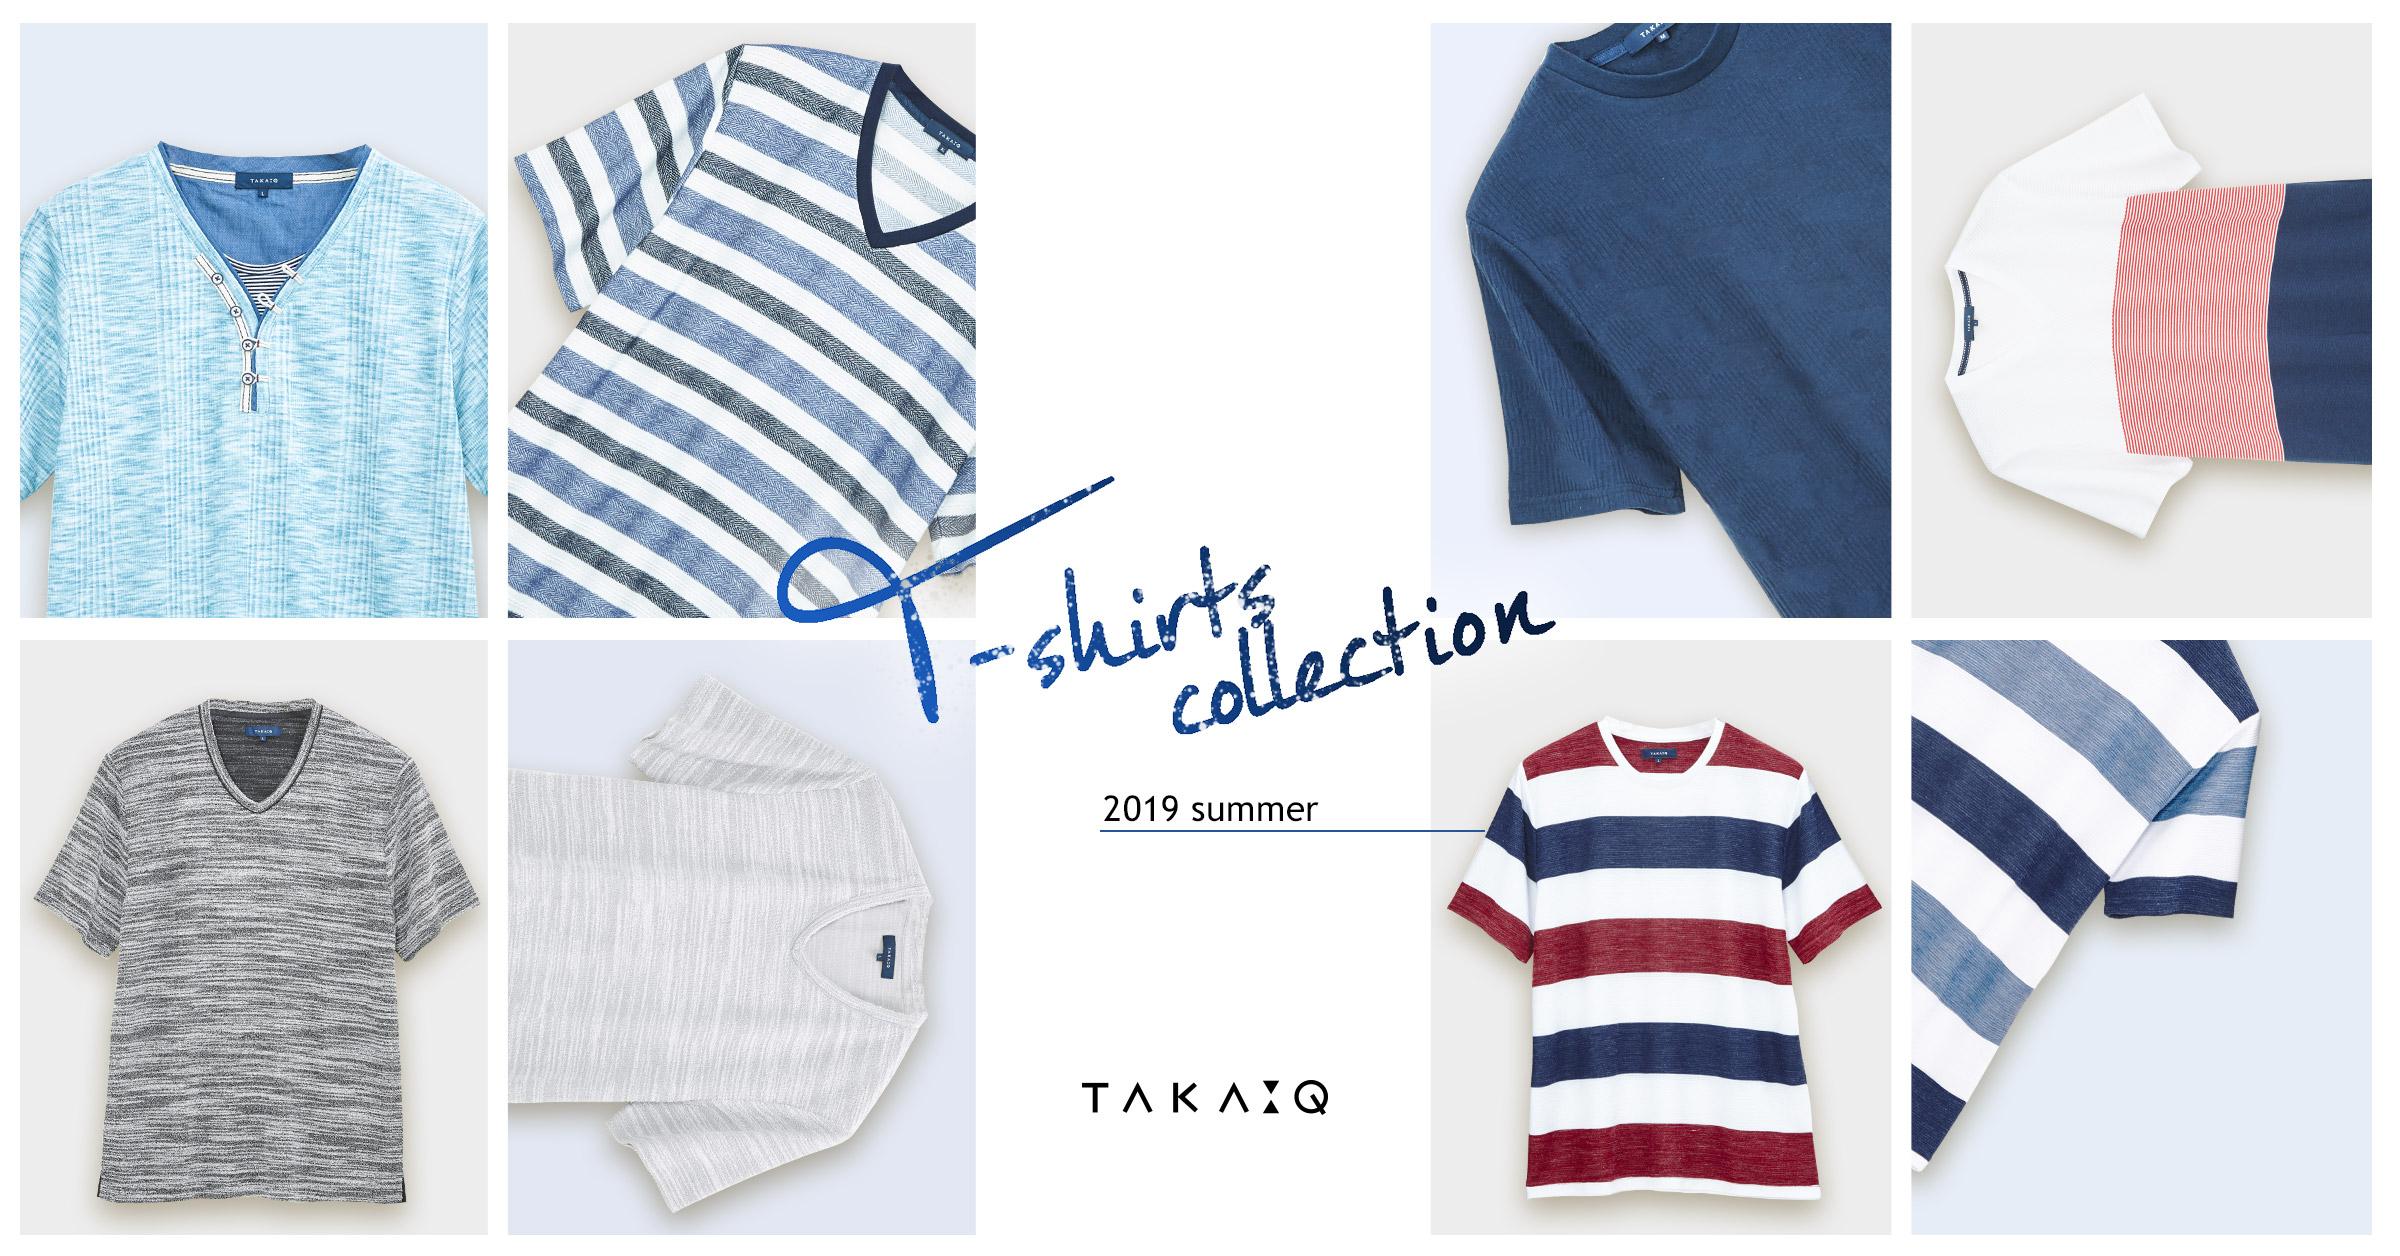 TAKA-Q Tシャツ特集